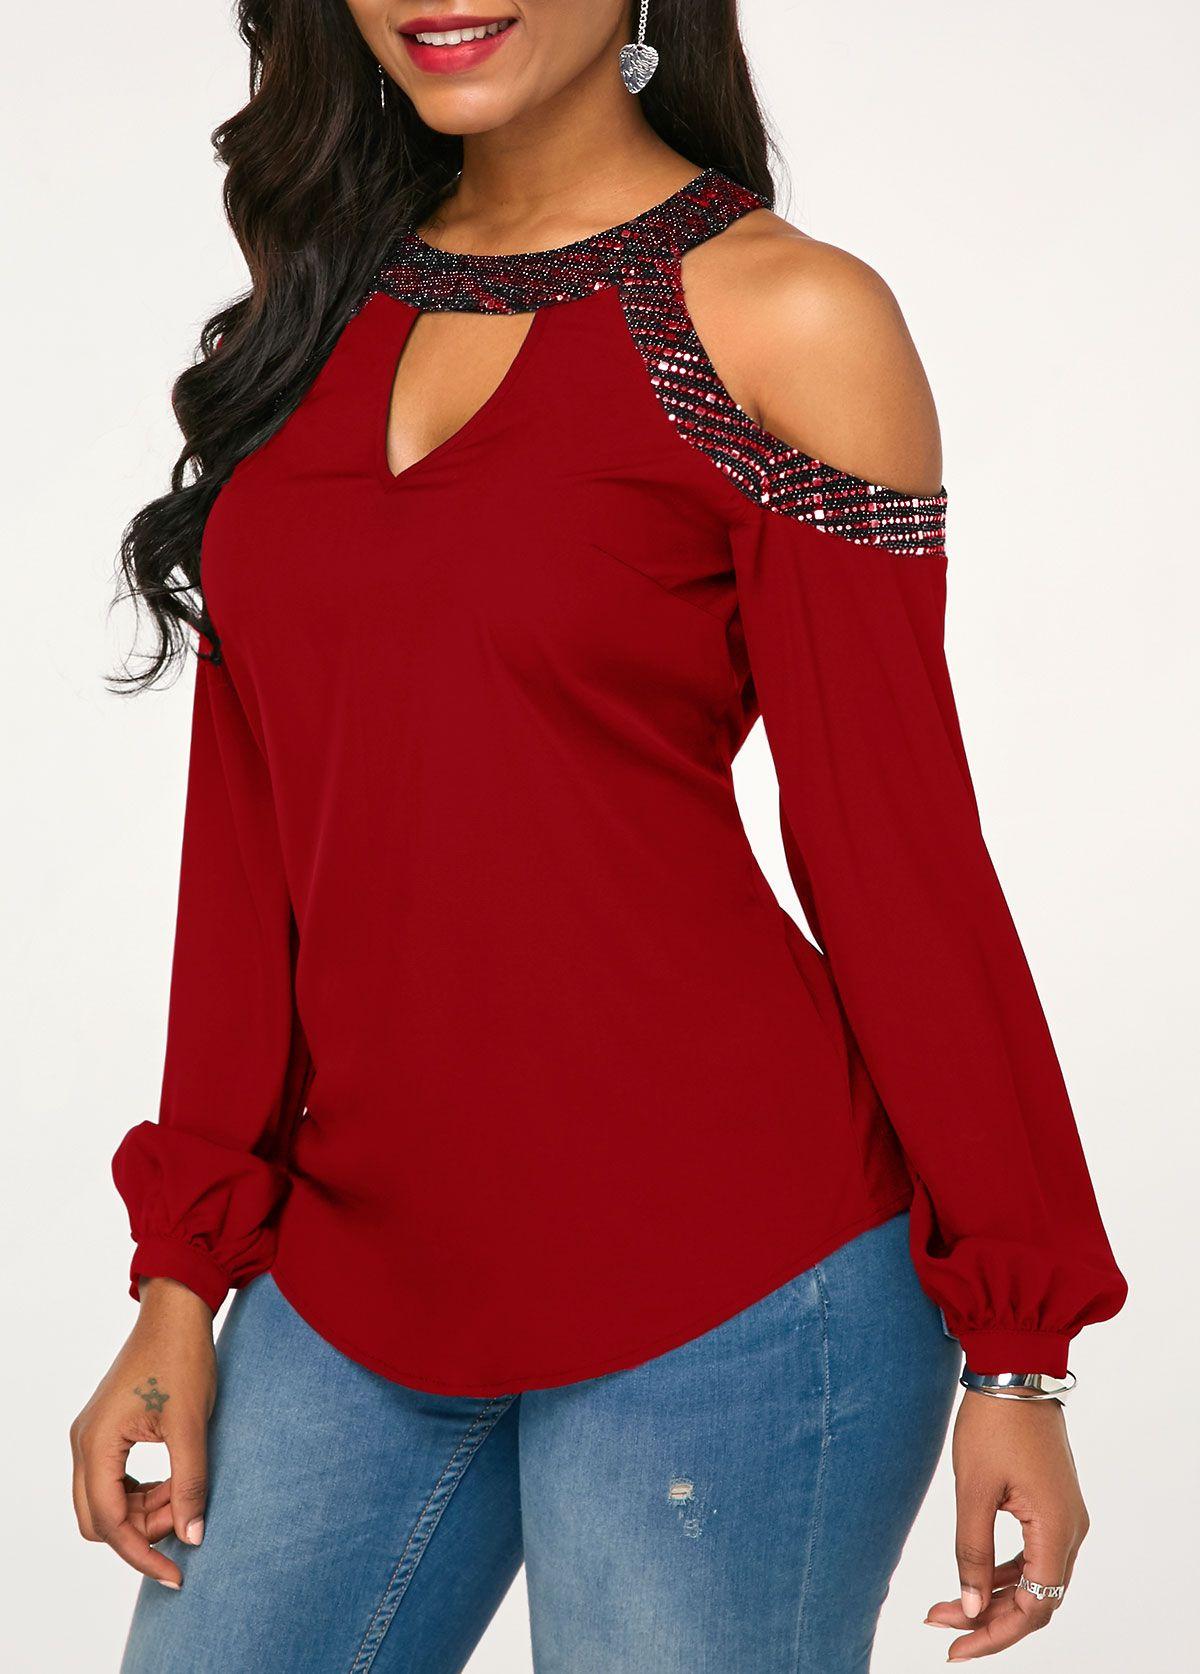 00847c9205e Embellished Neck Cold Shoulder Cutout Front Wine Red Blouse